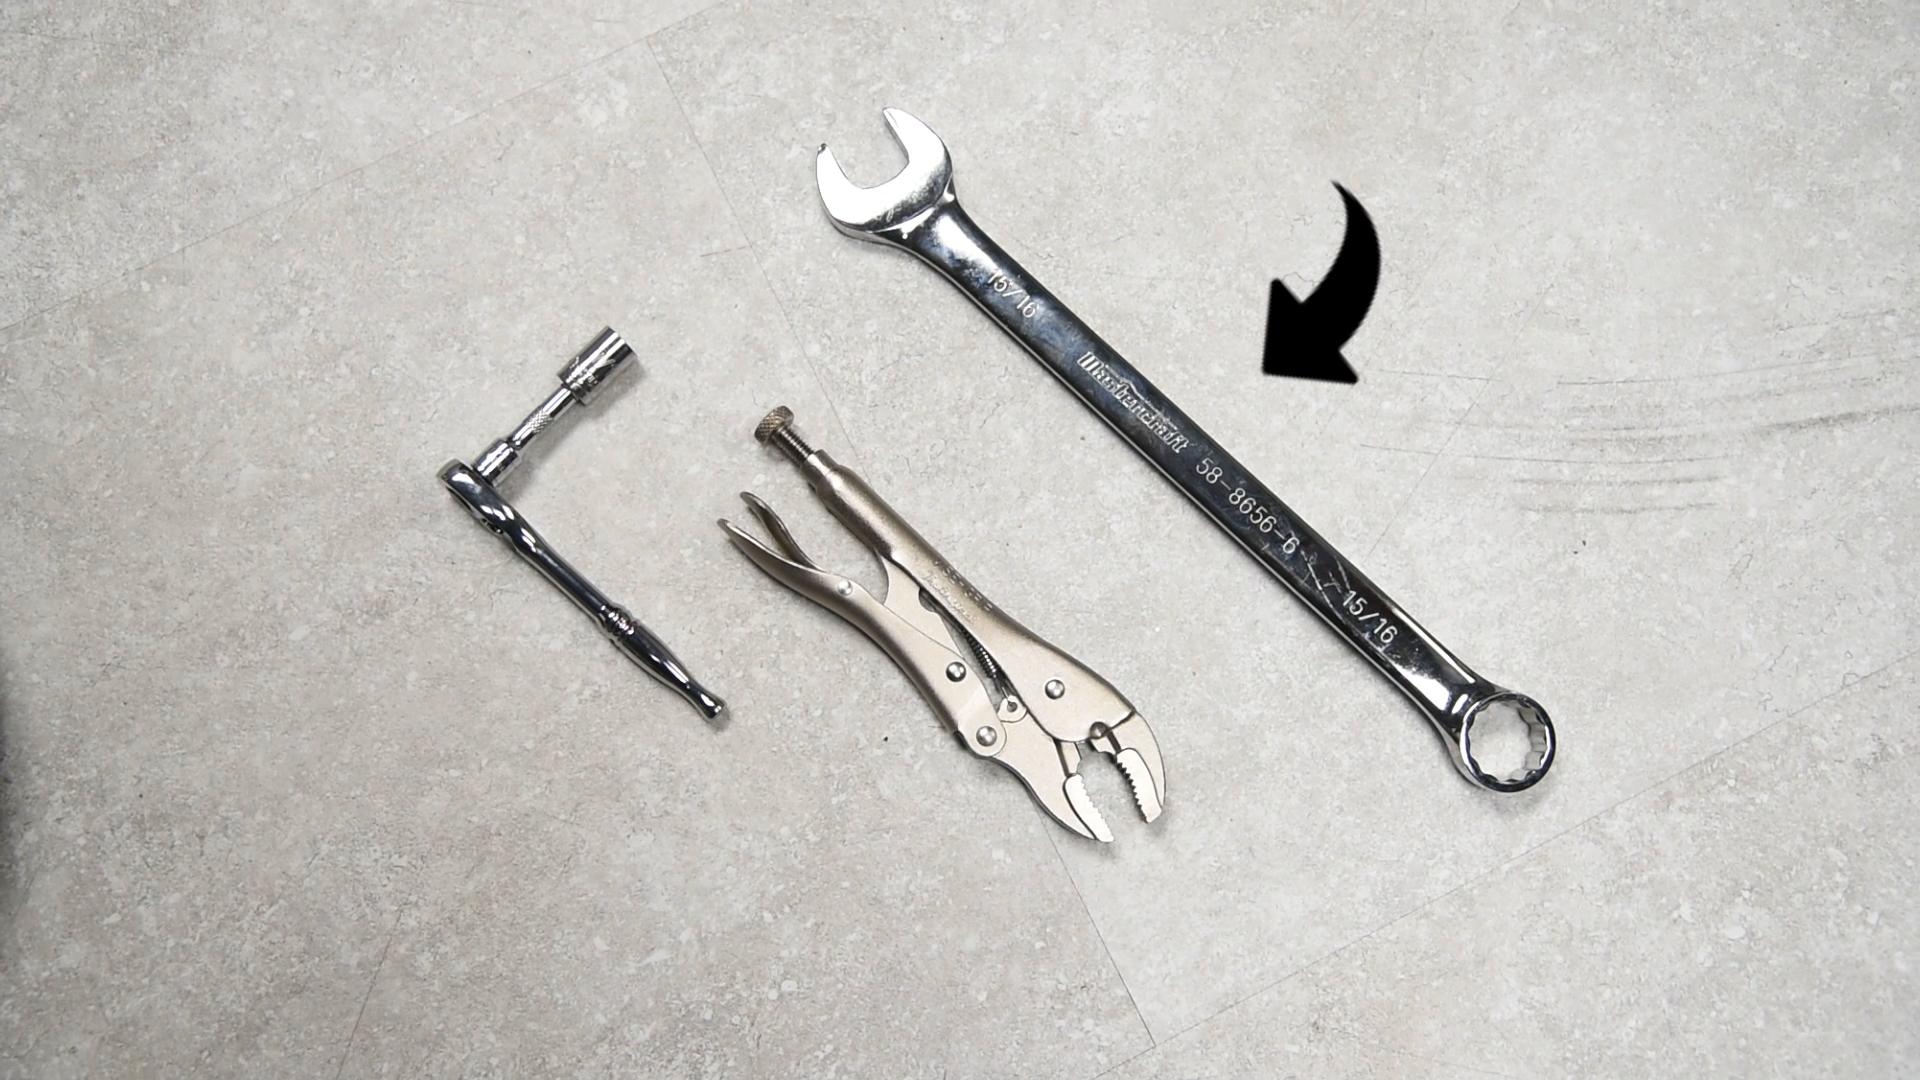 channel locks or vise grip locking pliers tools